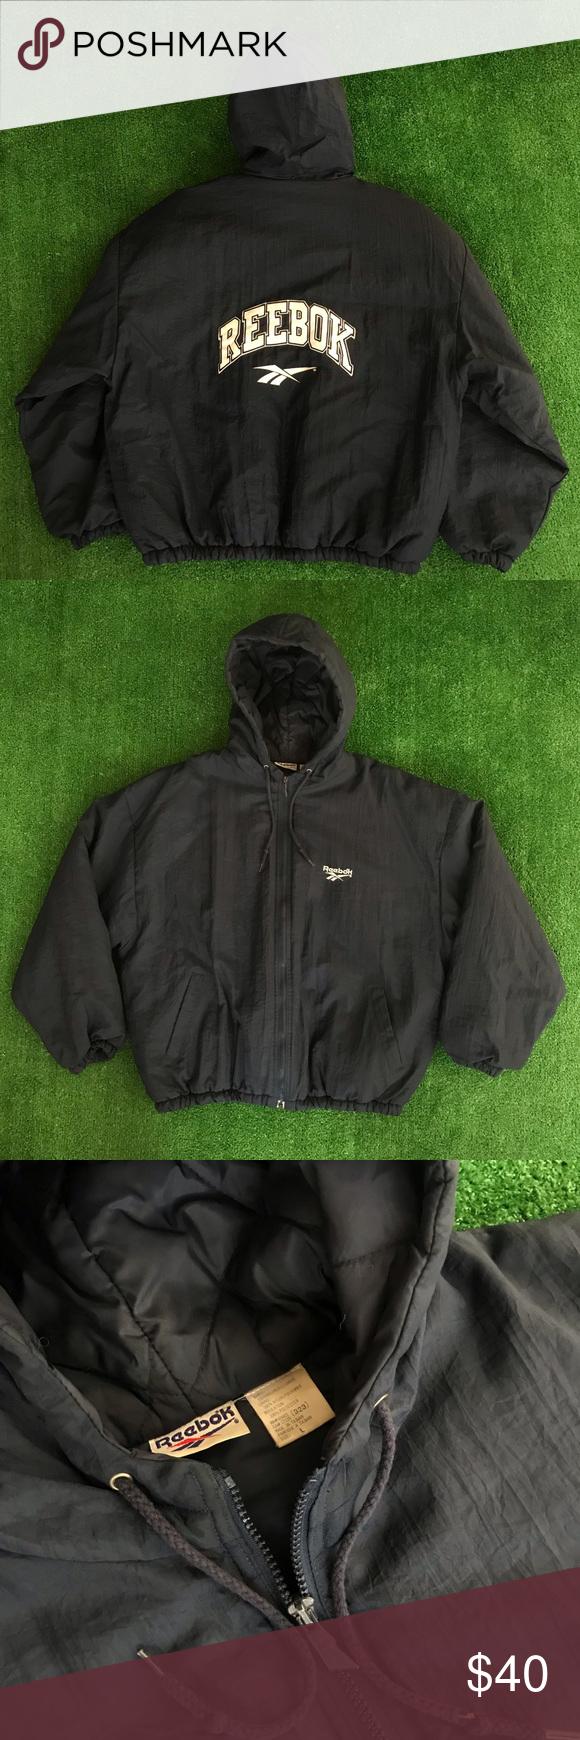 True 90 S Vintage Reebok Down Jacket Vintage Reebok Down Jacket Jackets [ 1740 x 580 Pixel ]